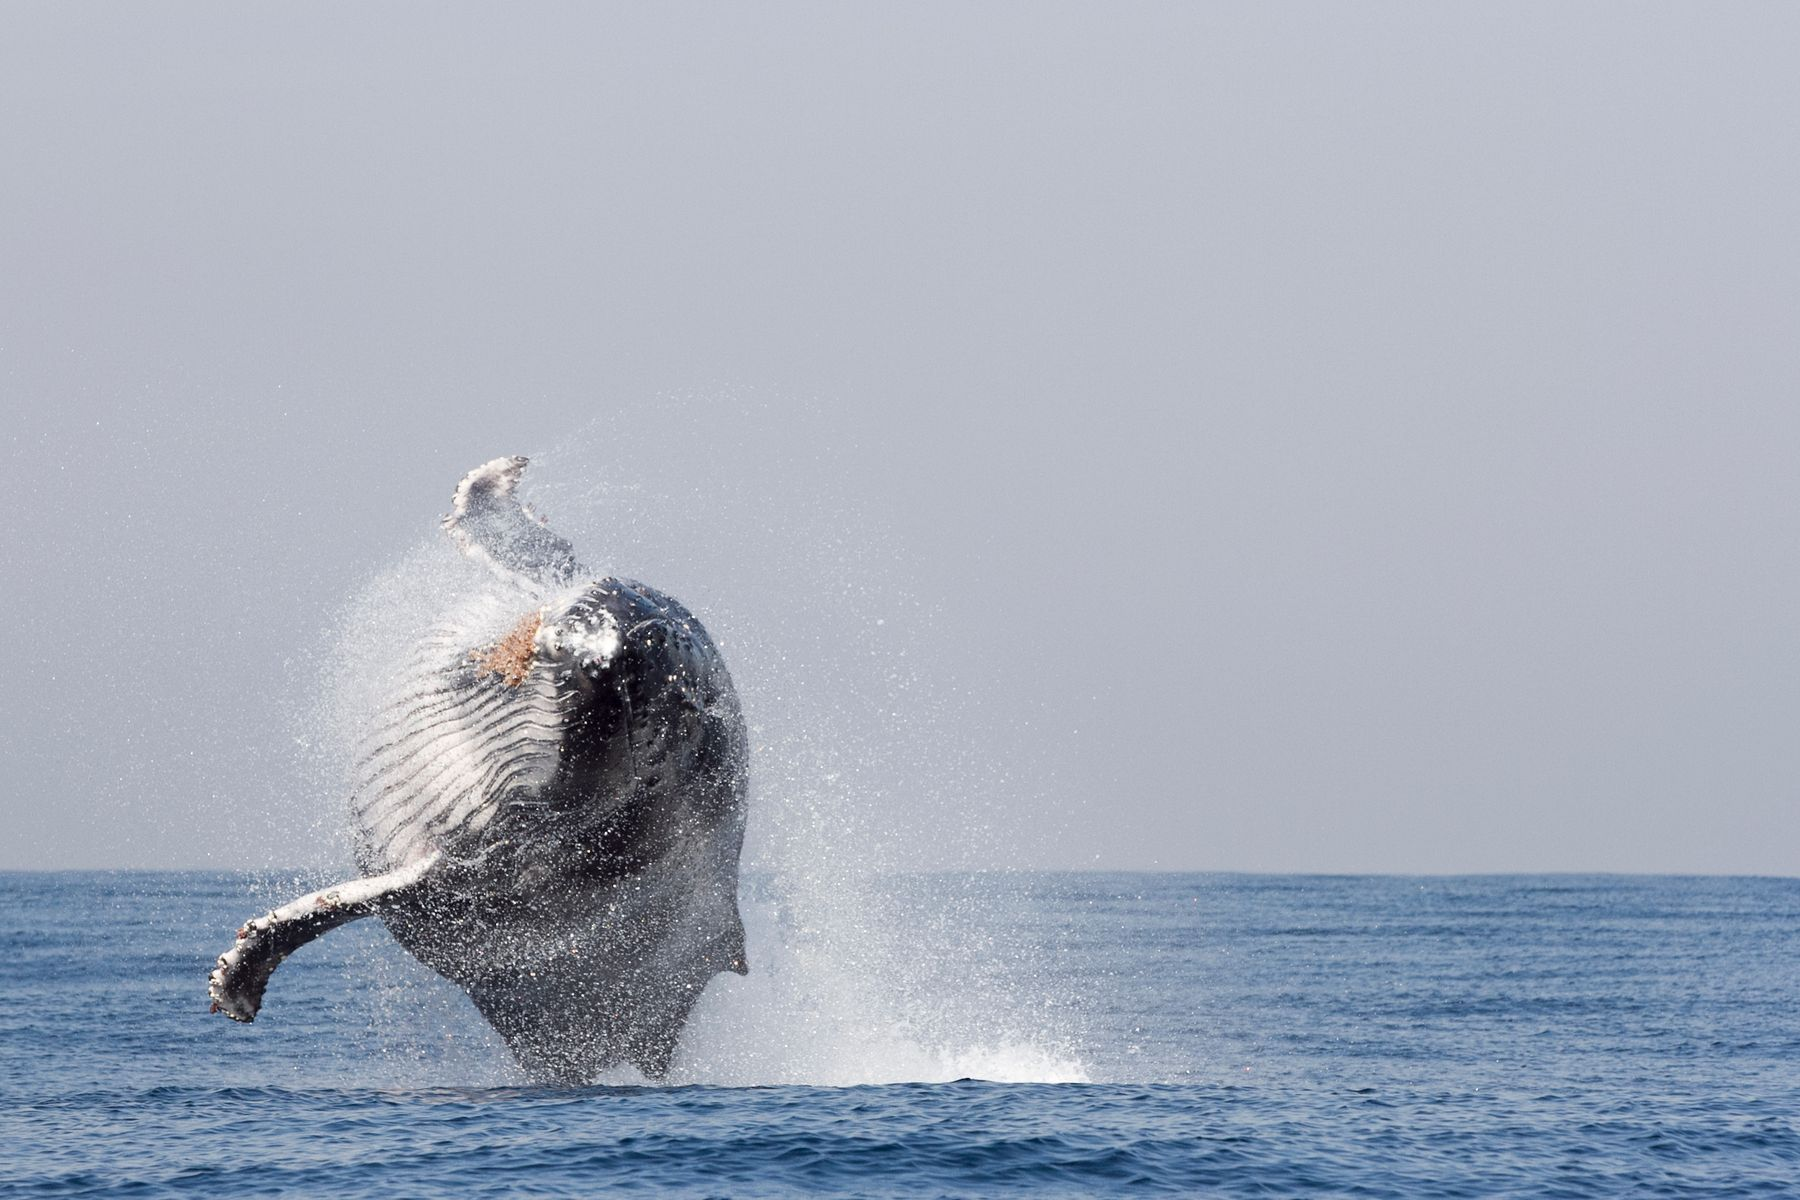 Whale watching in Merimbula